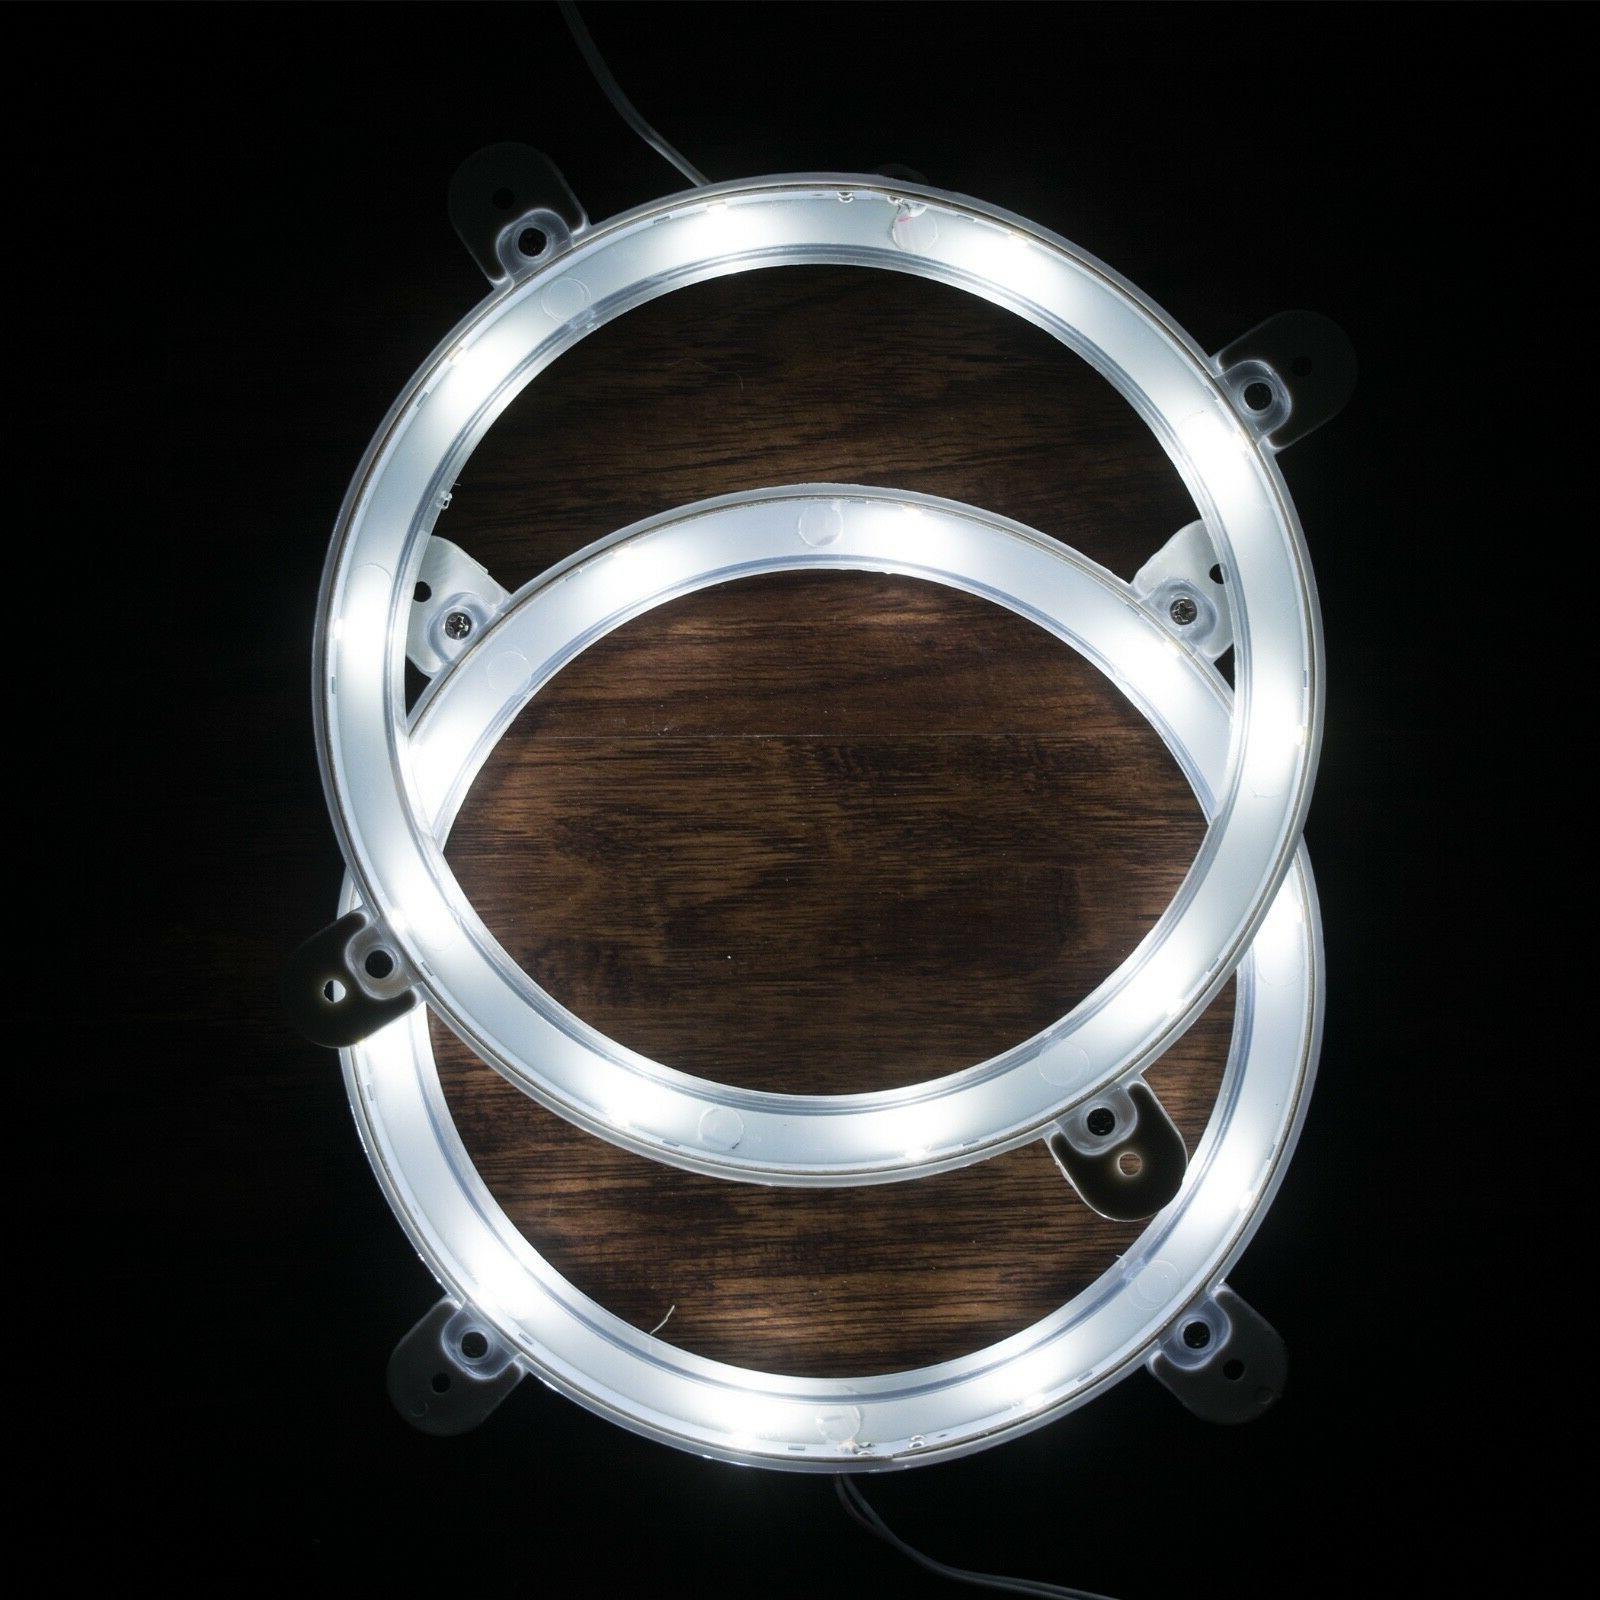 Set 2 Cornhole LED Night Lights & Corn Hole Bean Board